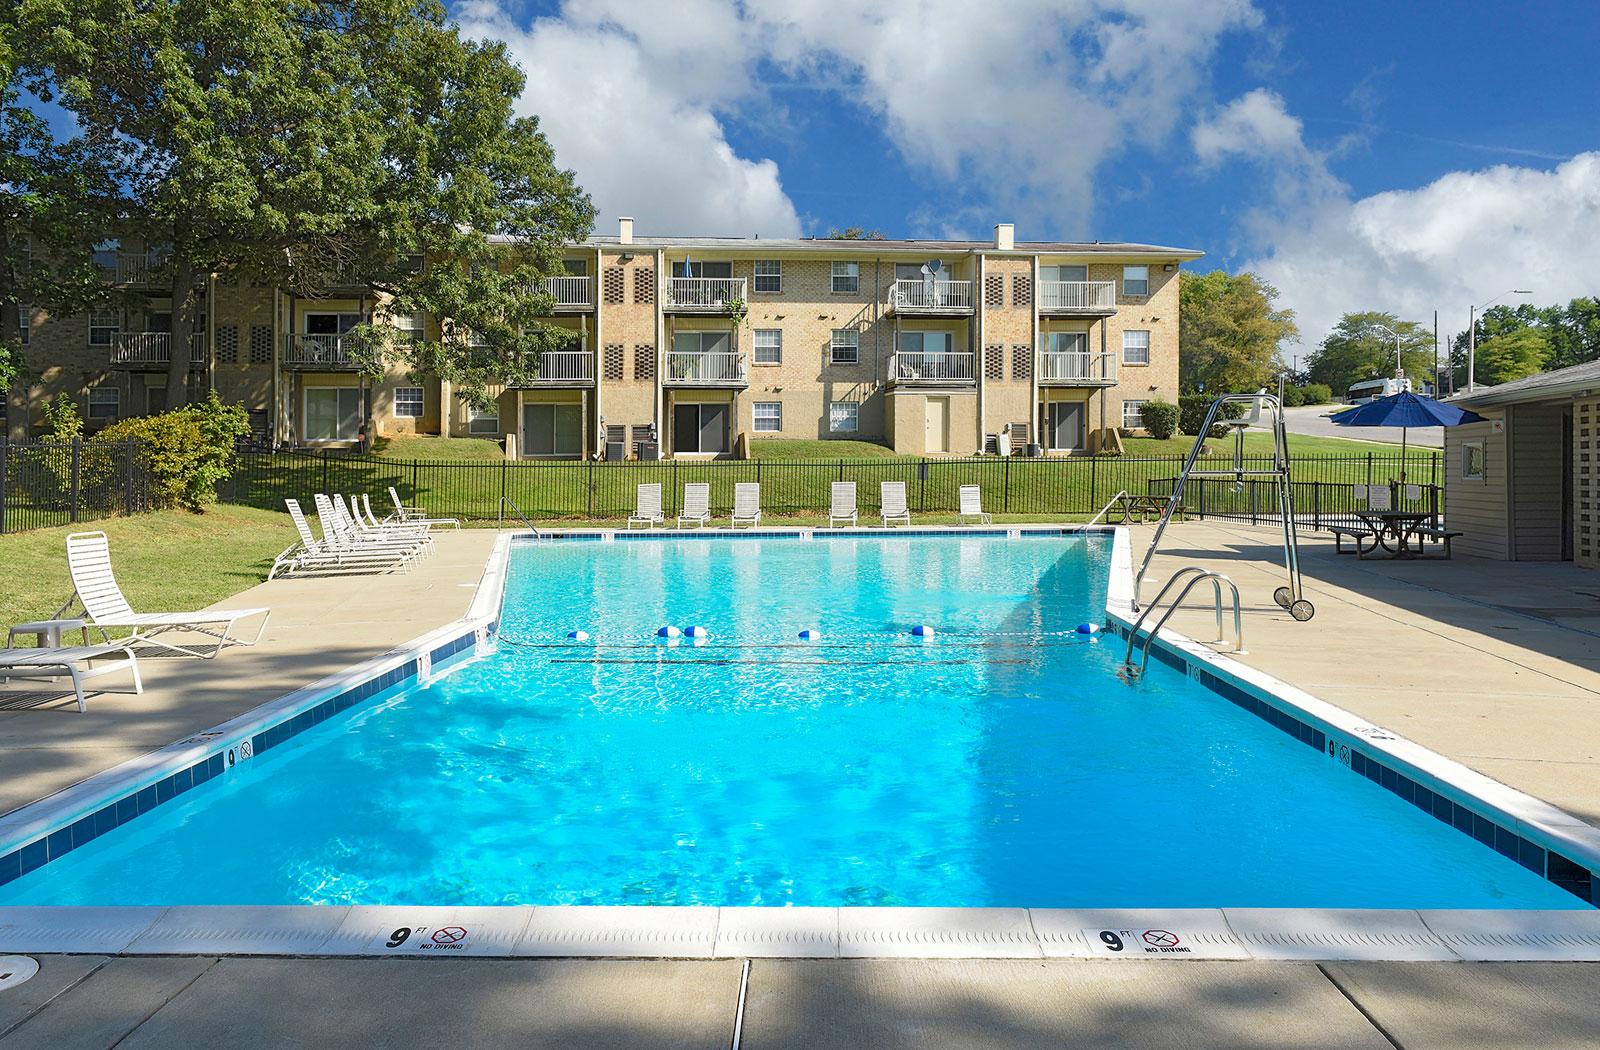 Kenilworth at Hazelwood Apartments image 1